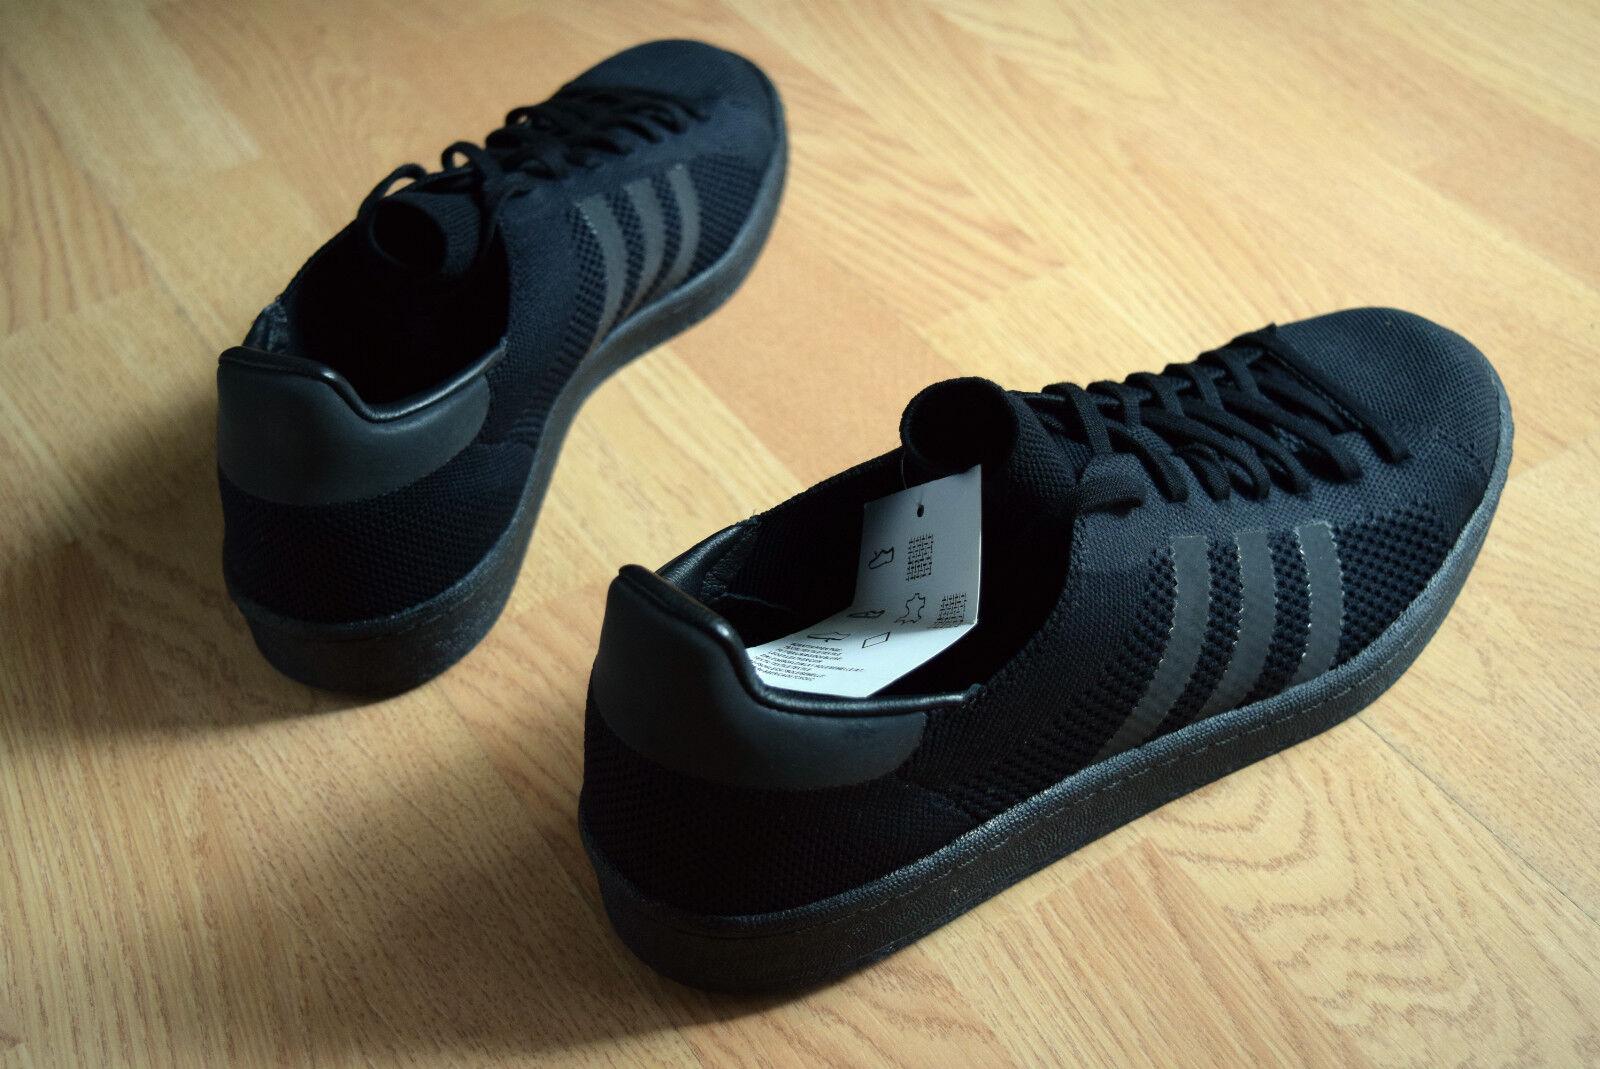 Adidas 80's Campus 80's Adidas Primeknit 40 40,5 44 46 s78406 Superstar Stan Smith PK 901f14